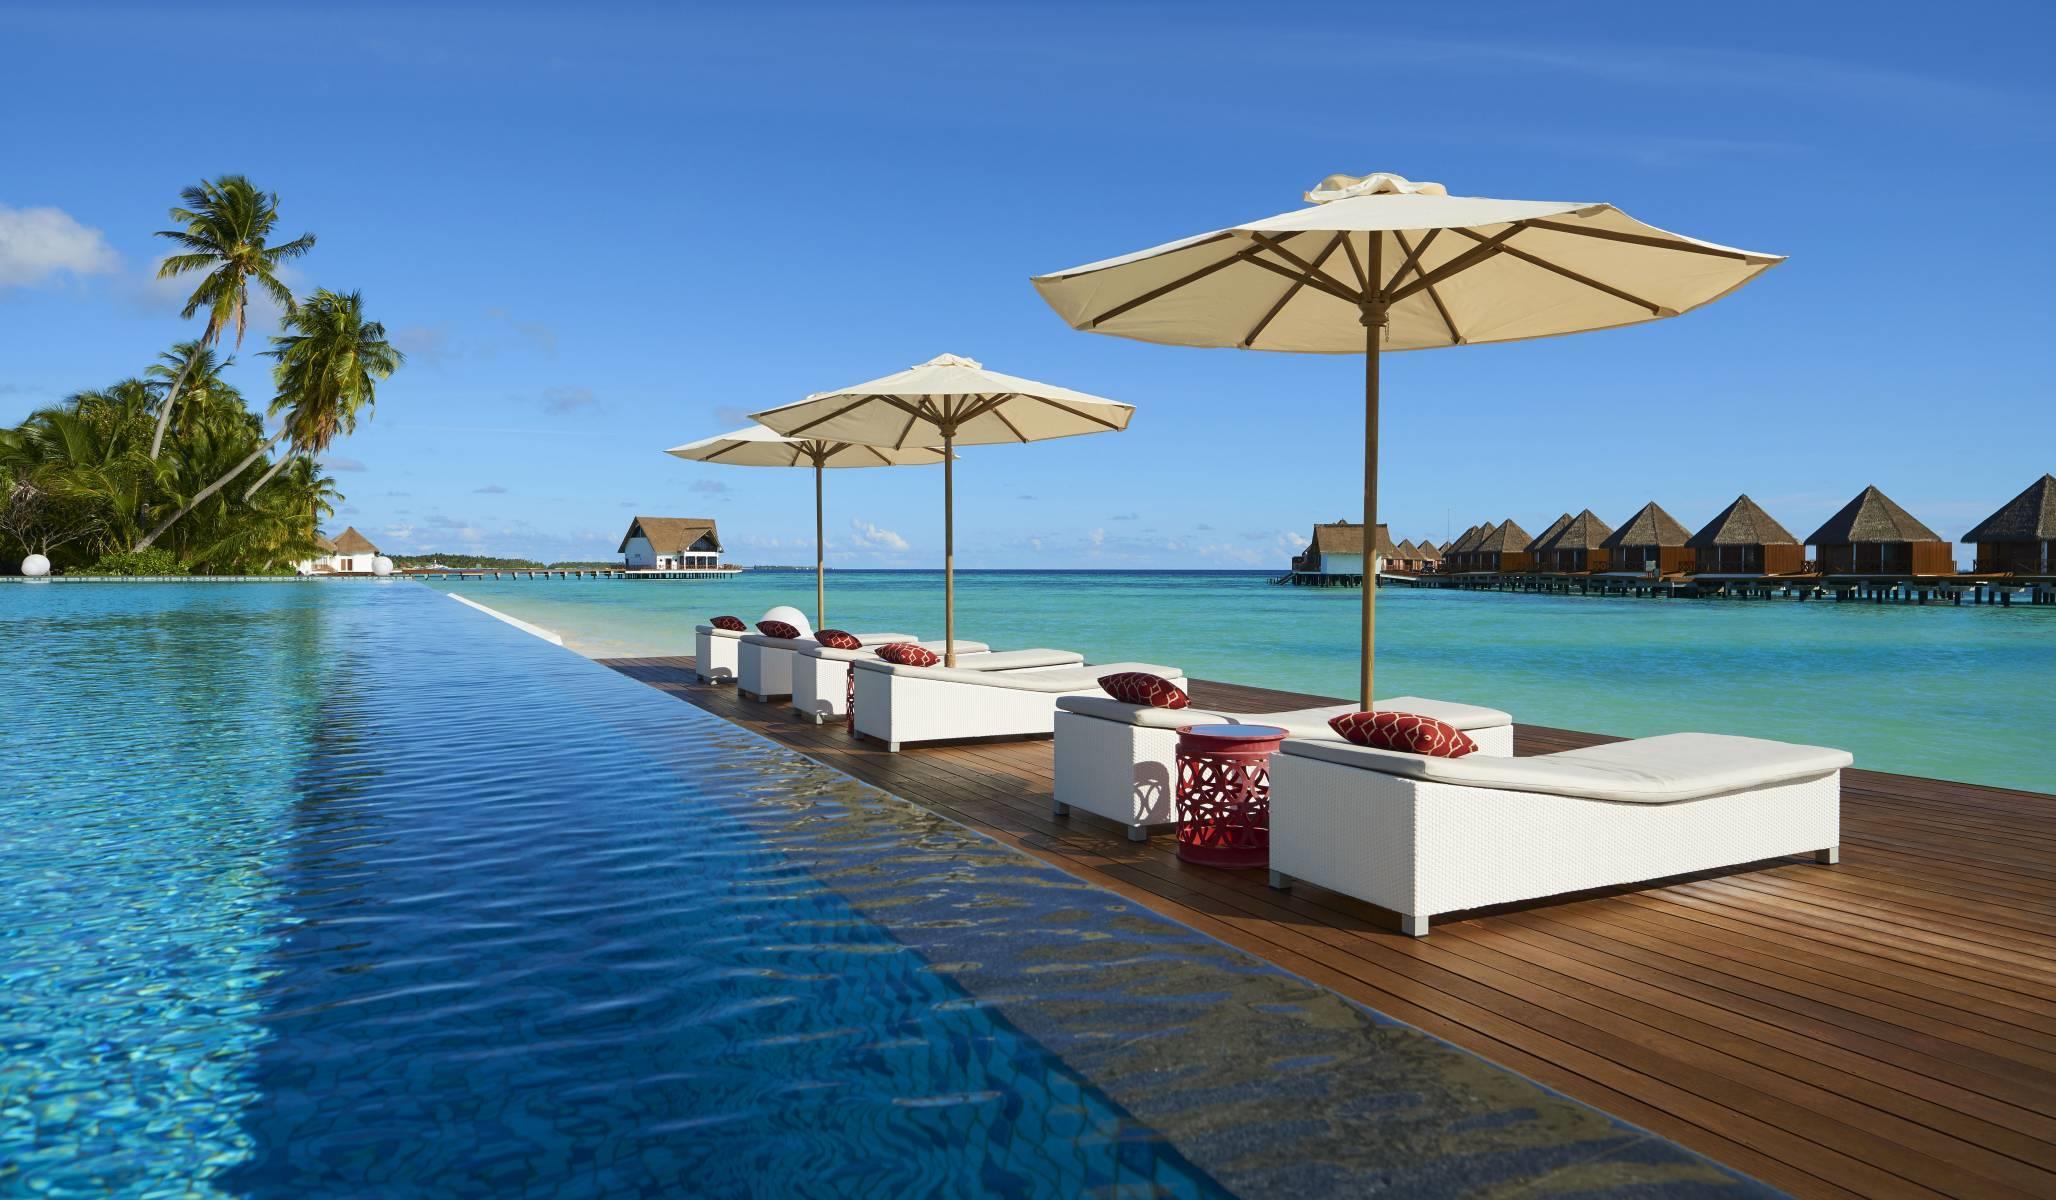 mercure-maldives-kooddoo-resort-genel-001